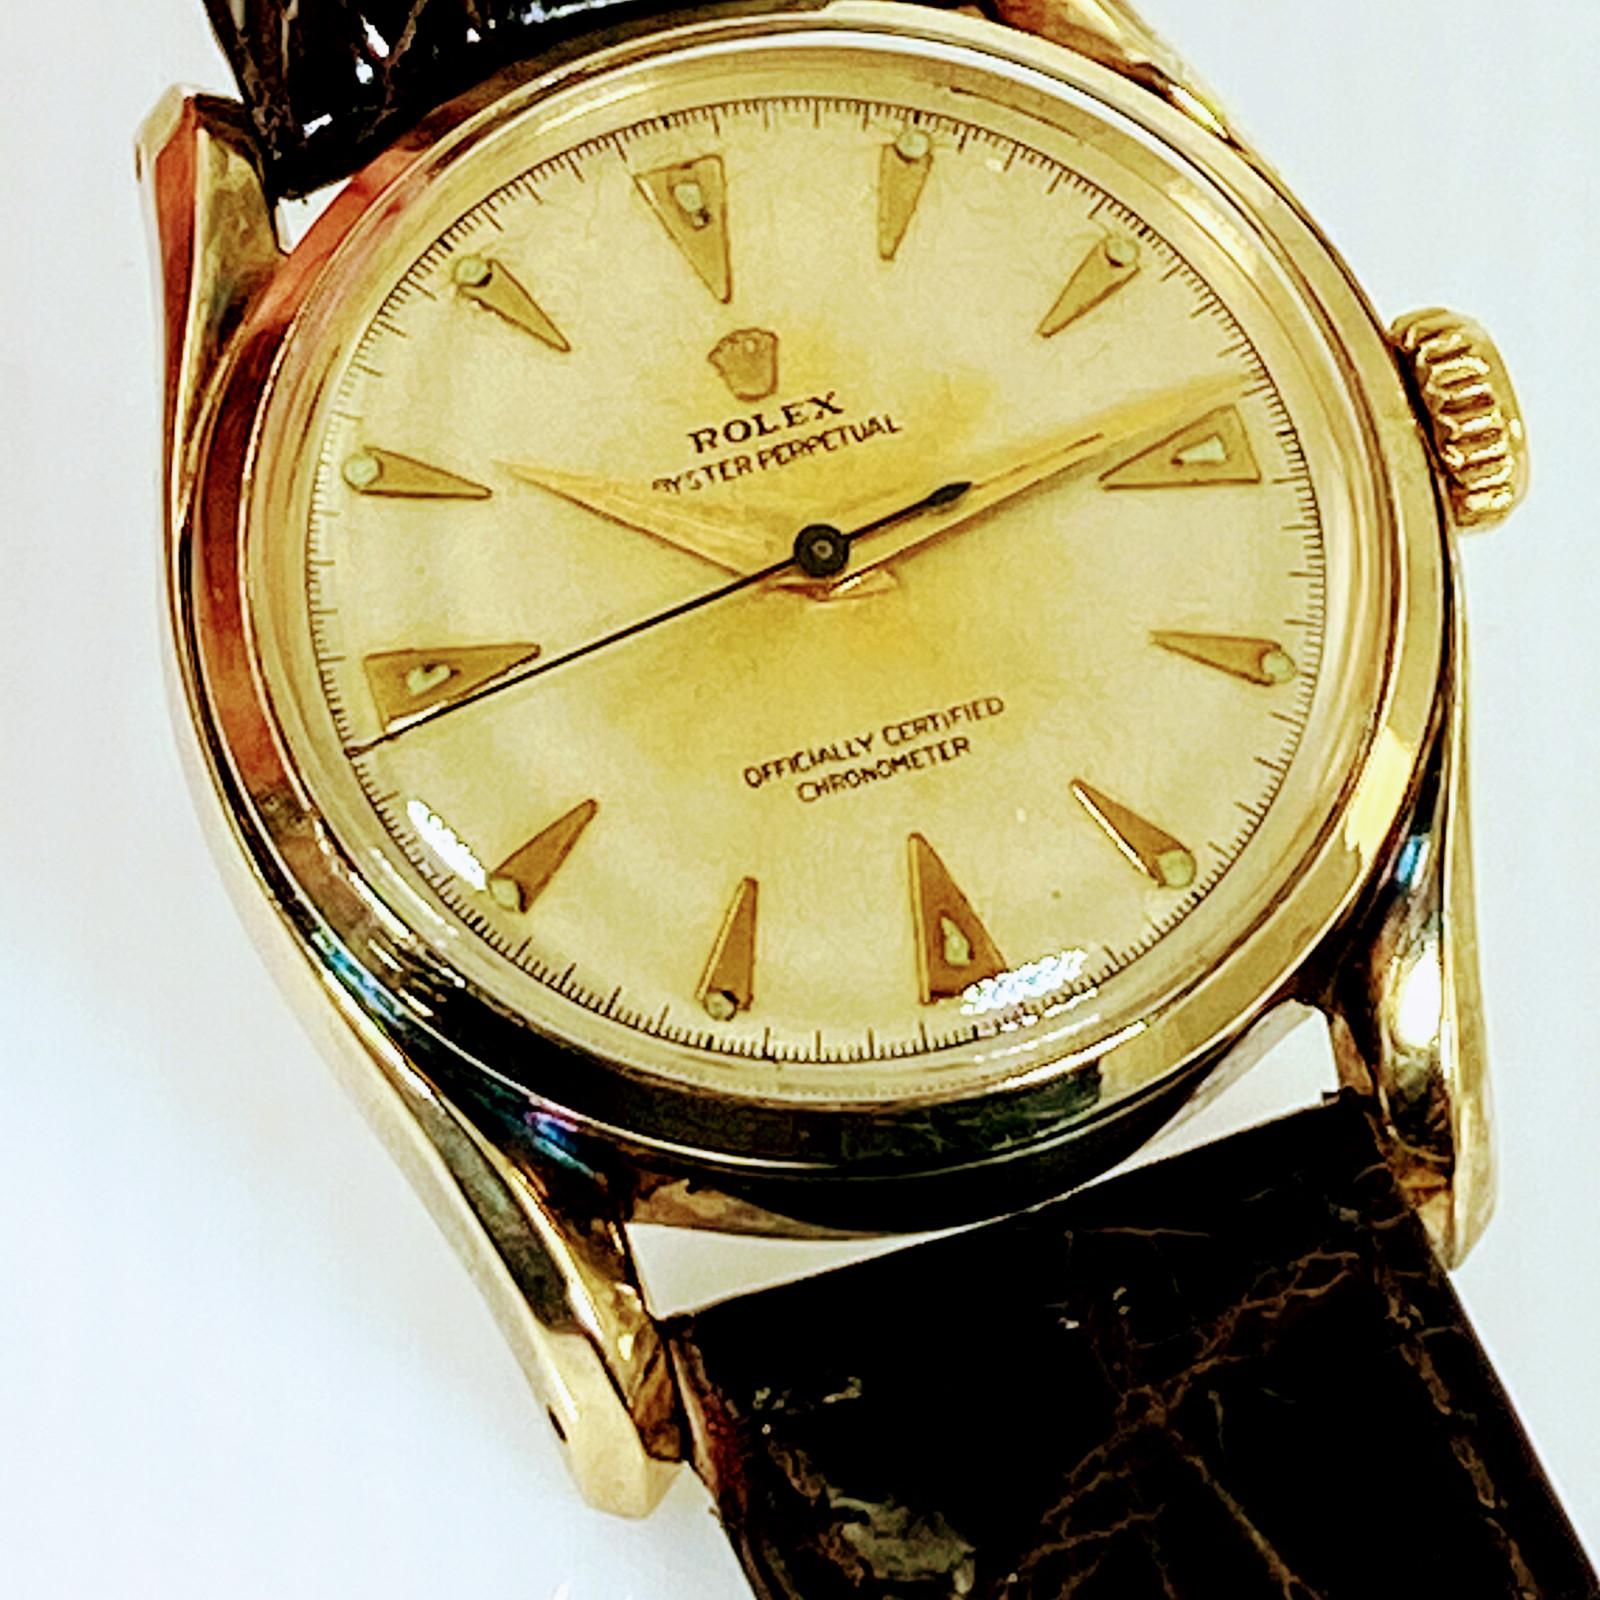 Rolex Model 6018 Gold